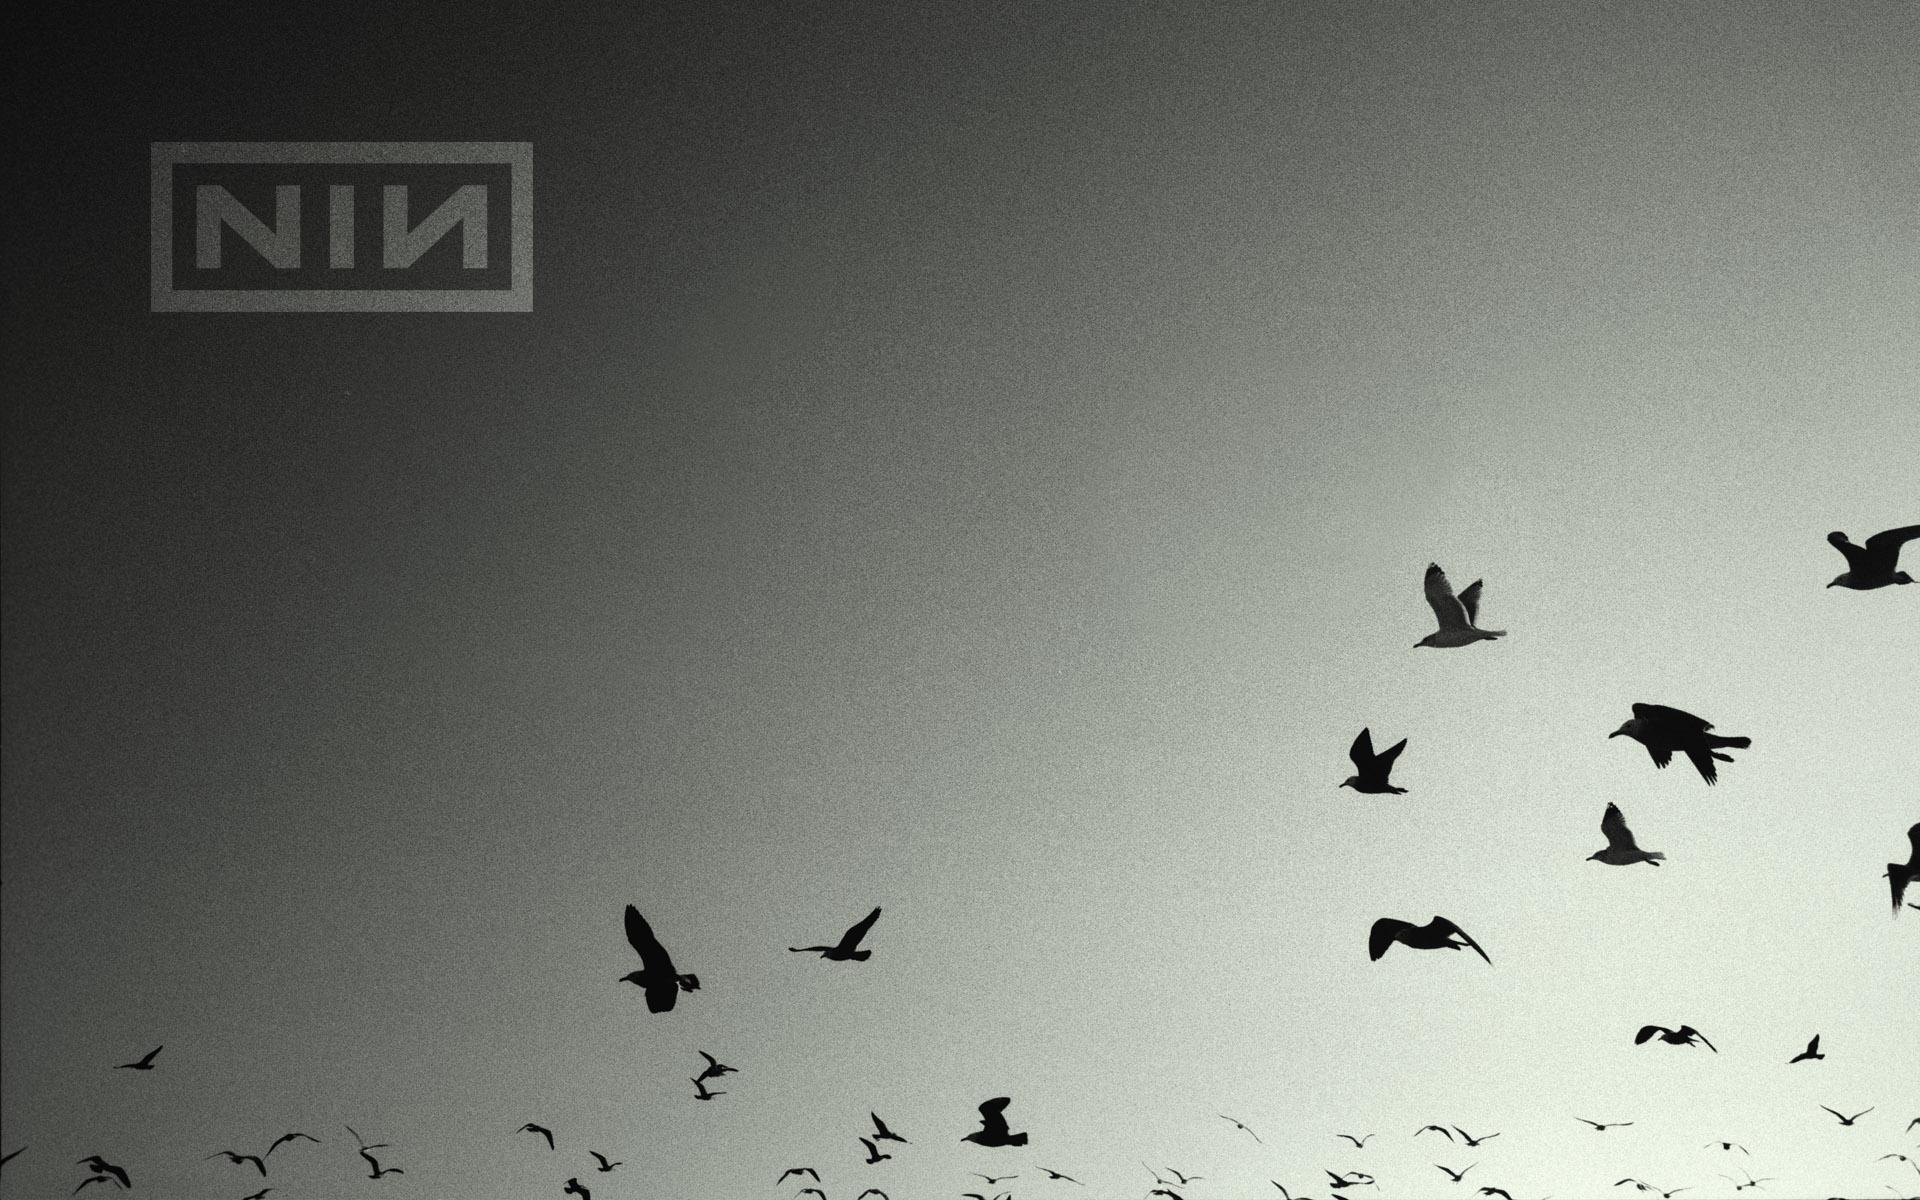 Nine Inch Nails | division / matt sparling